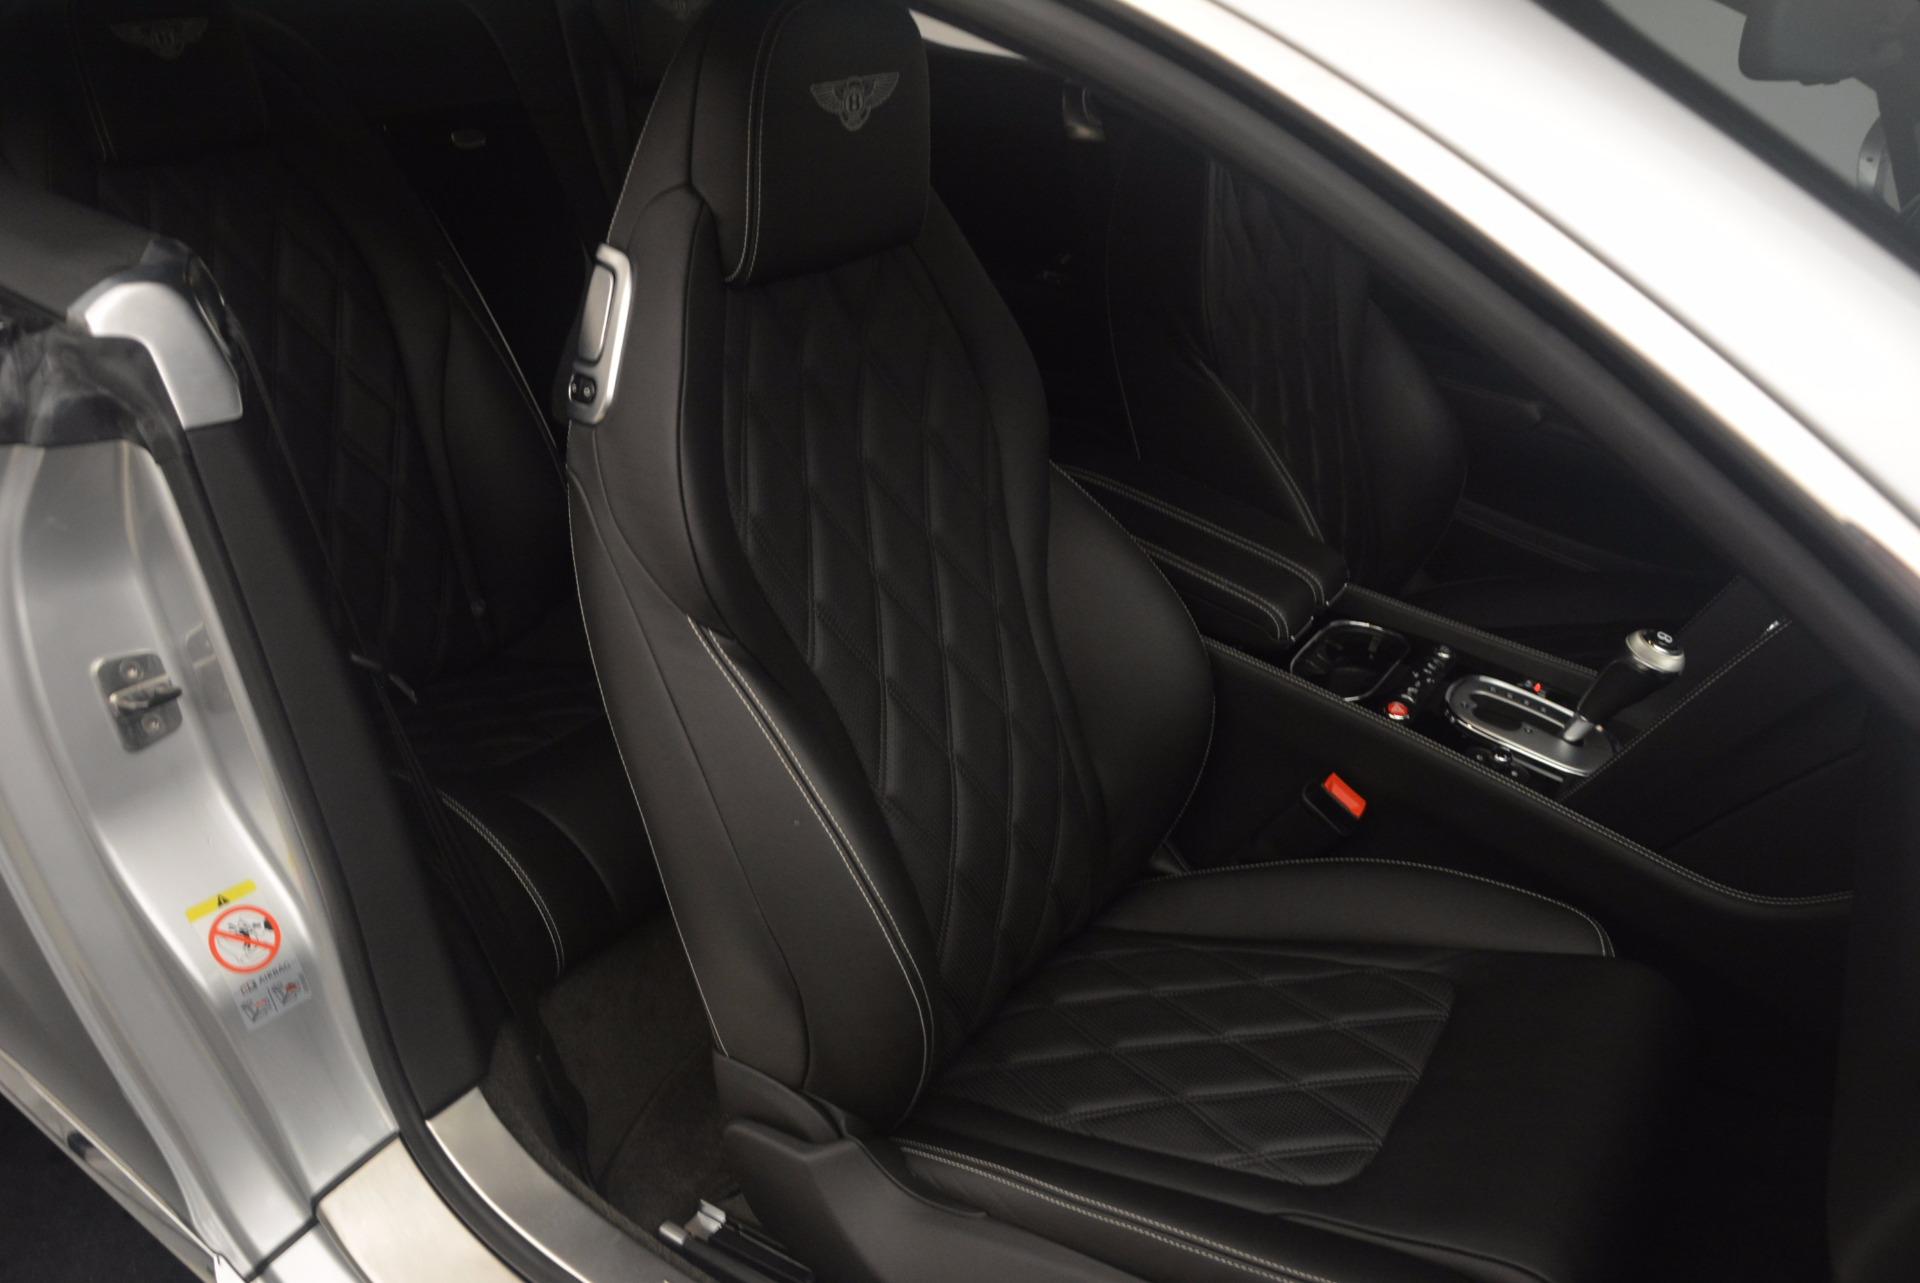 Used 2012 Bentley Continental GT  For Sale In Westport, CT 1176_p31